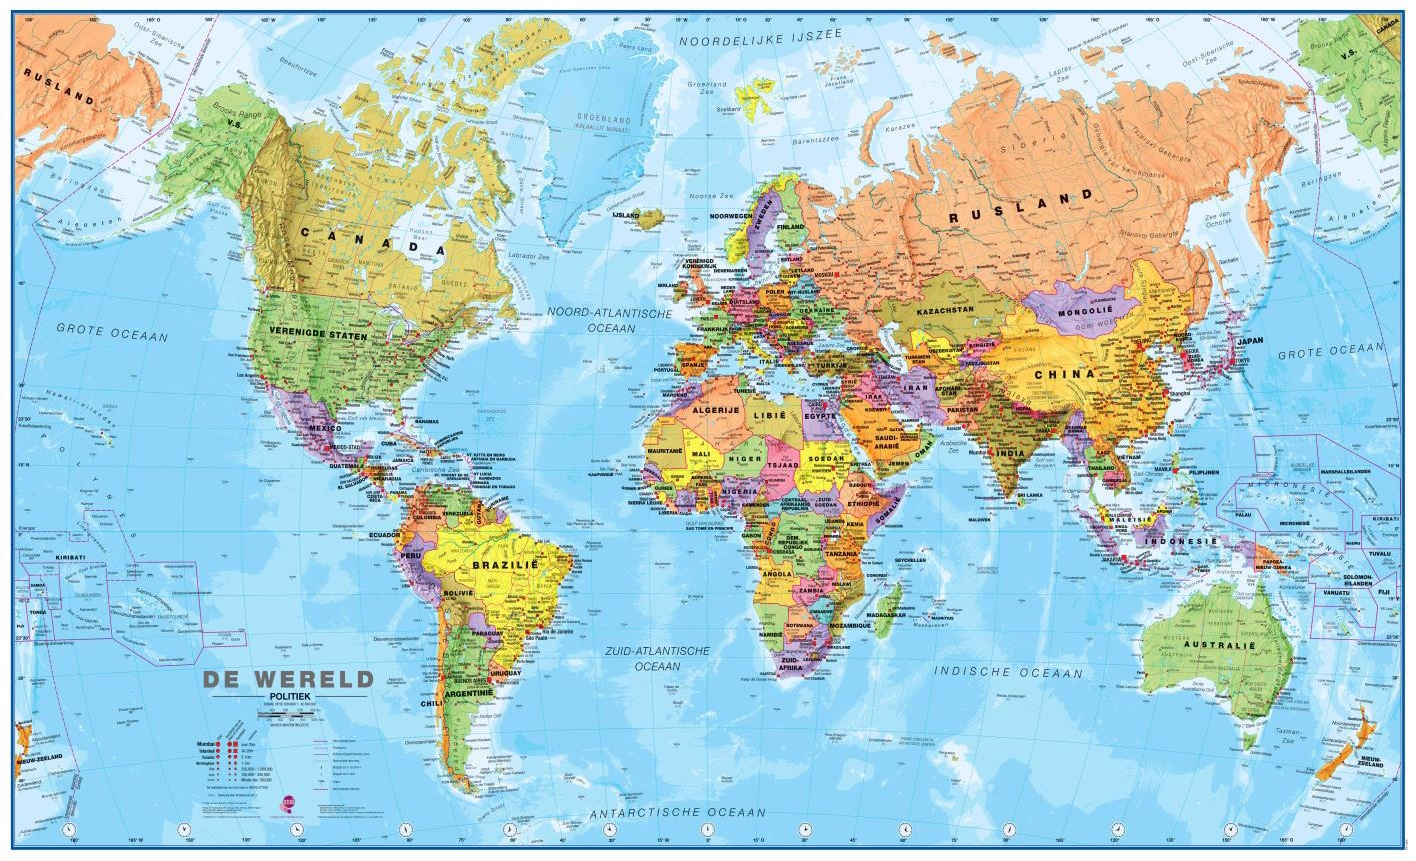 Wereldkaart 66PH-zvl Politiek, 136 x 86 cm   Maps International de zwerver